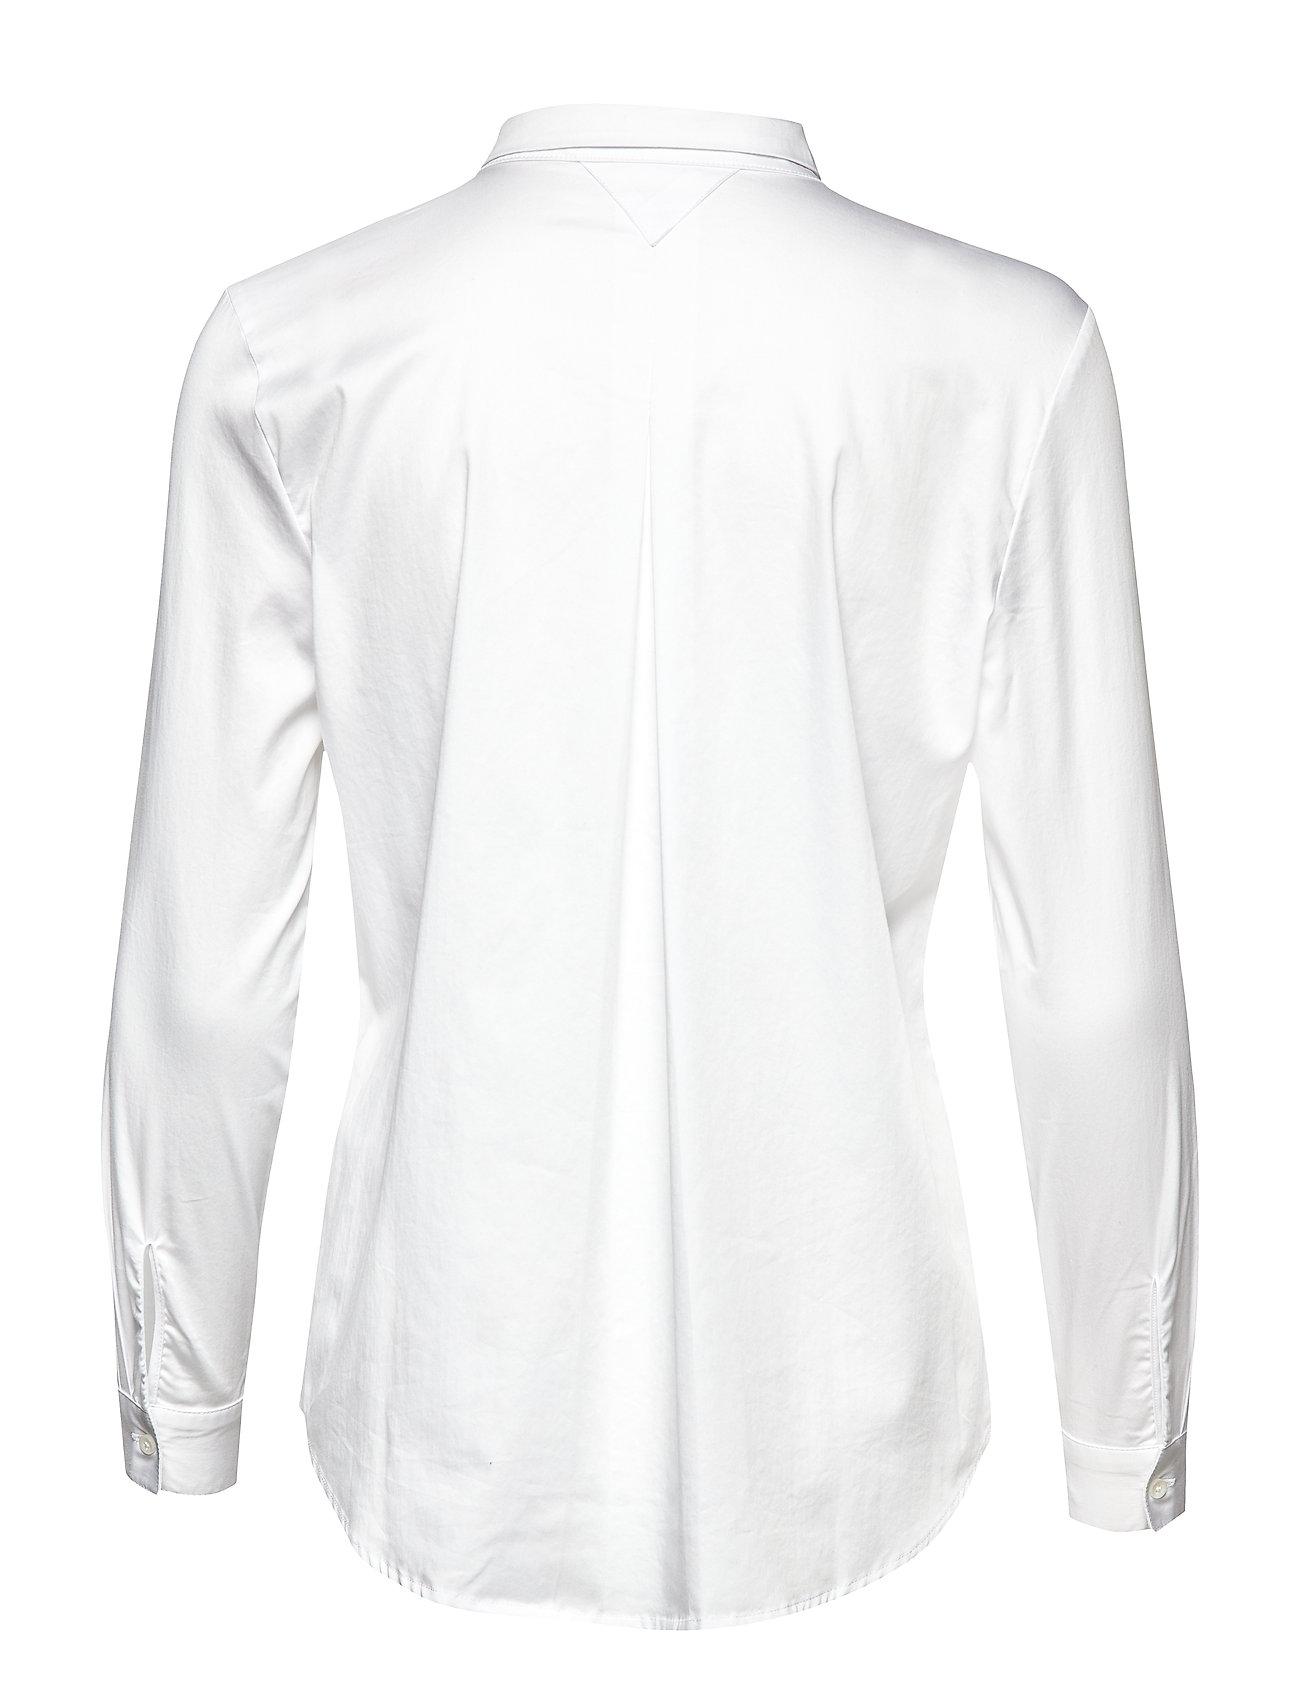 Coster Copenhagen Feminin Fit skjorte med plisse Hvid